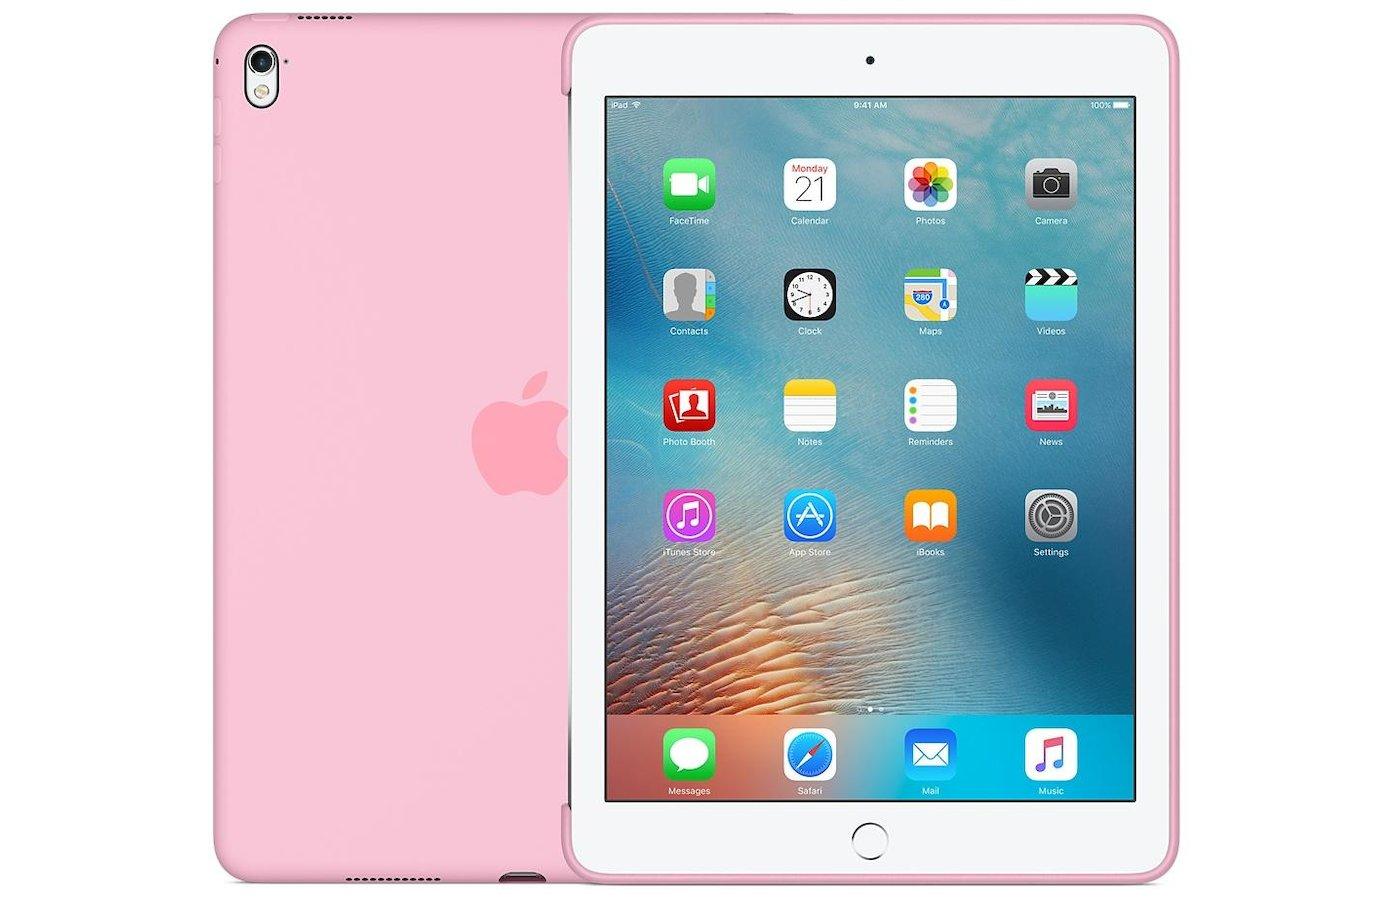 Чехол для планшетного ПК Apple Silicone Case iPad Pro 9.7 - Light Pink (MM242ZM/A)